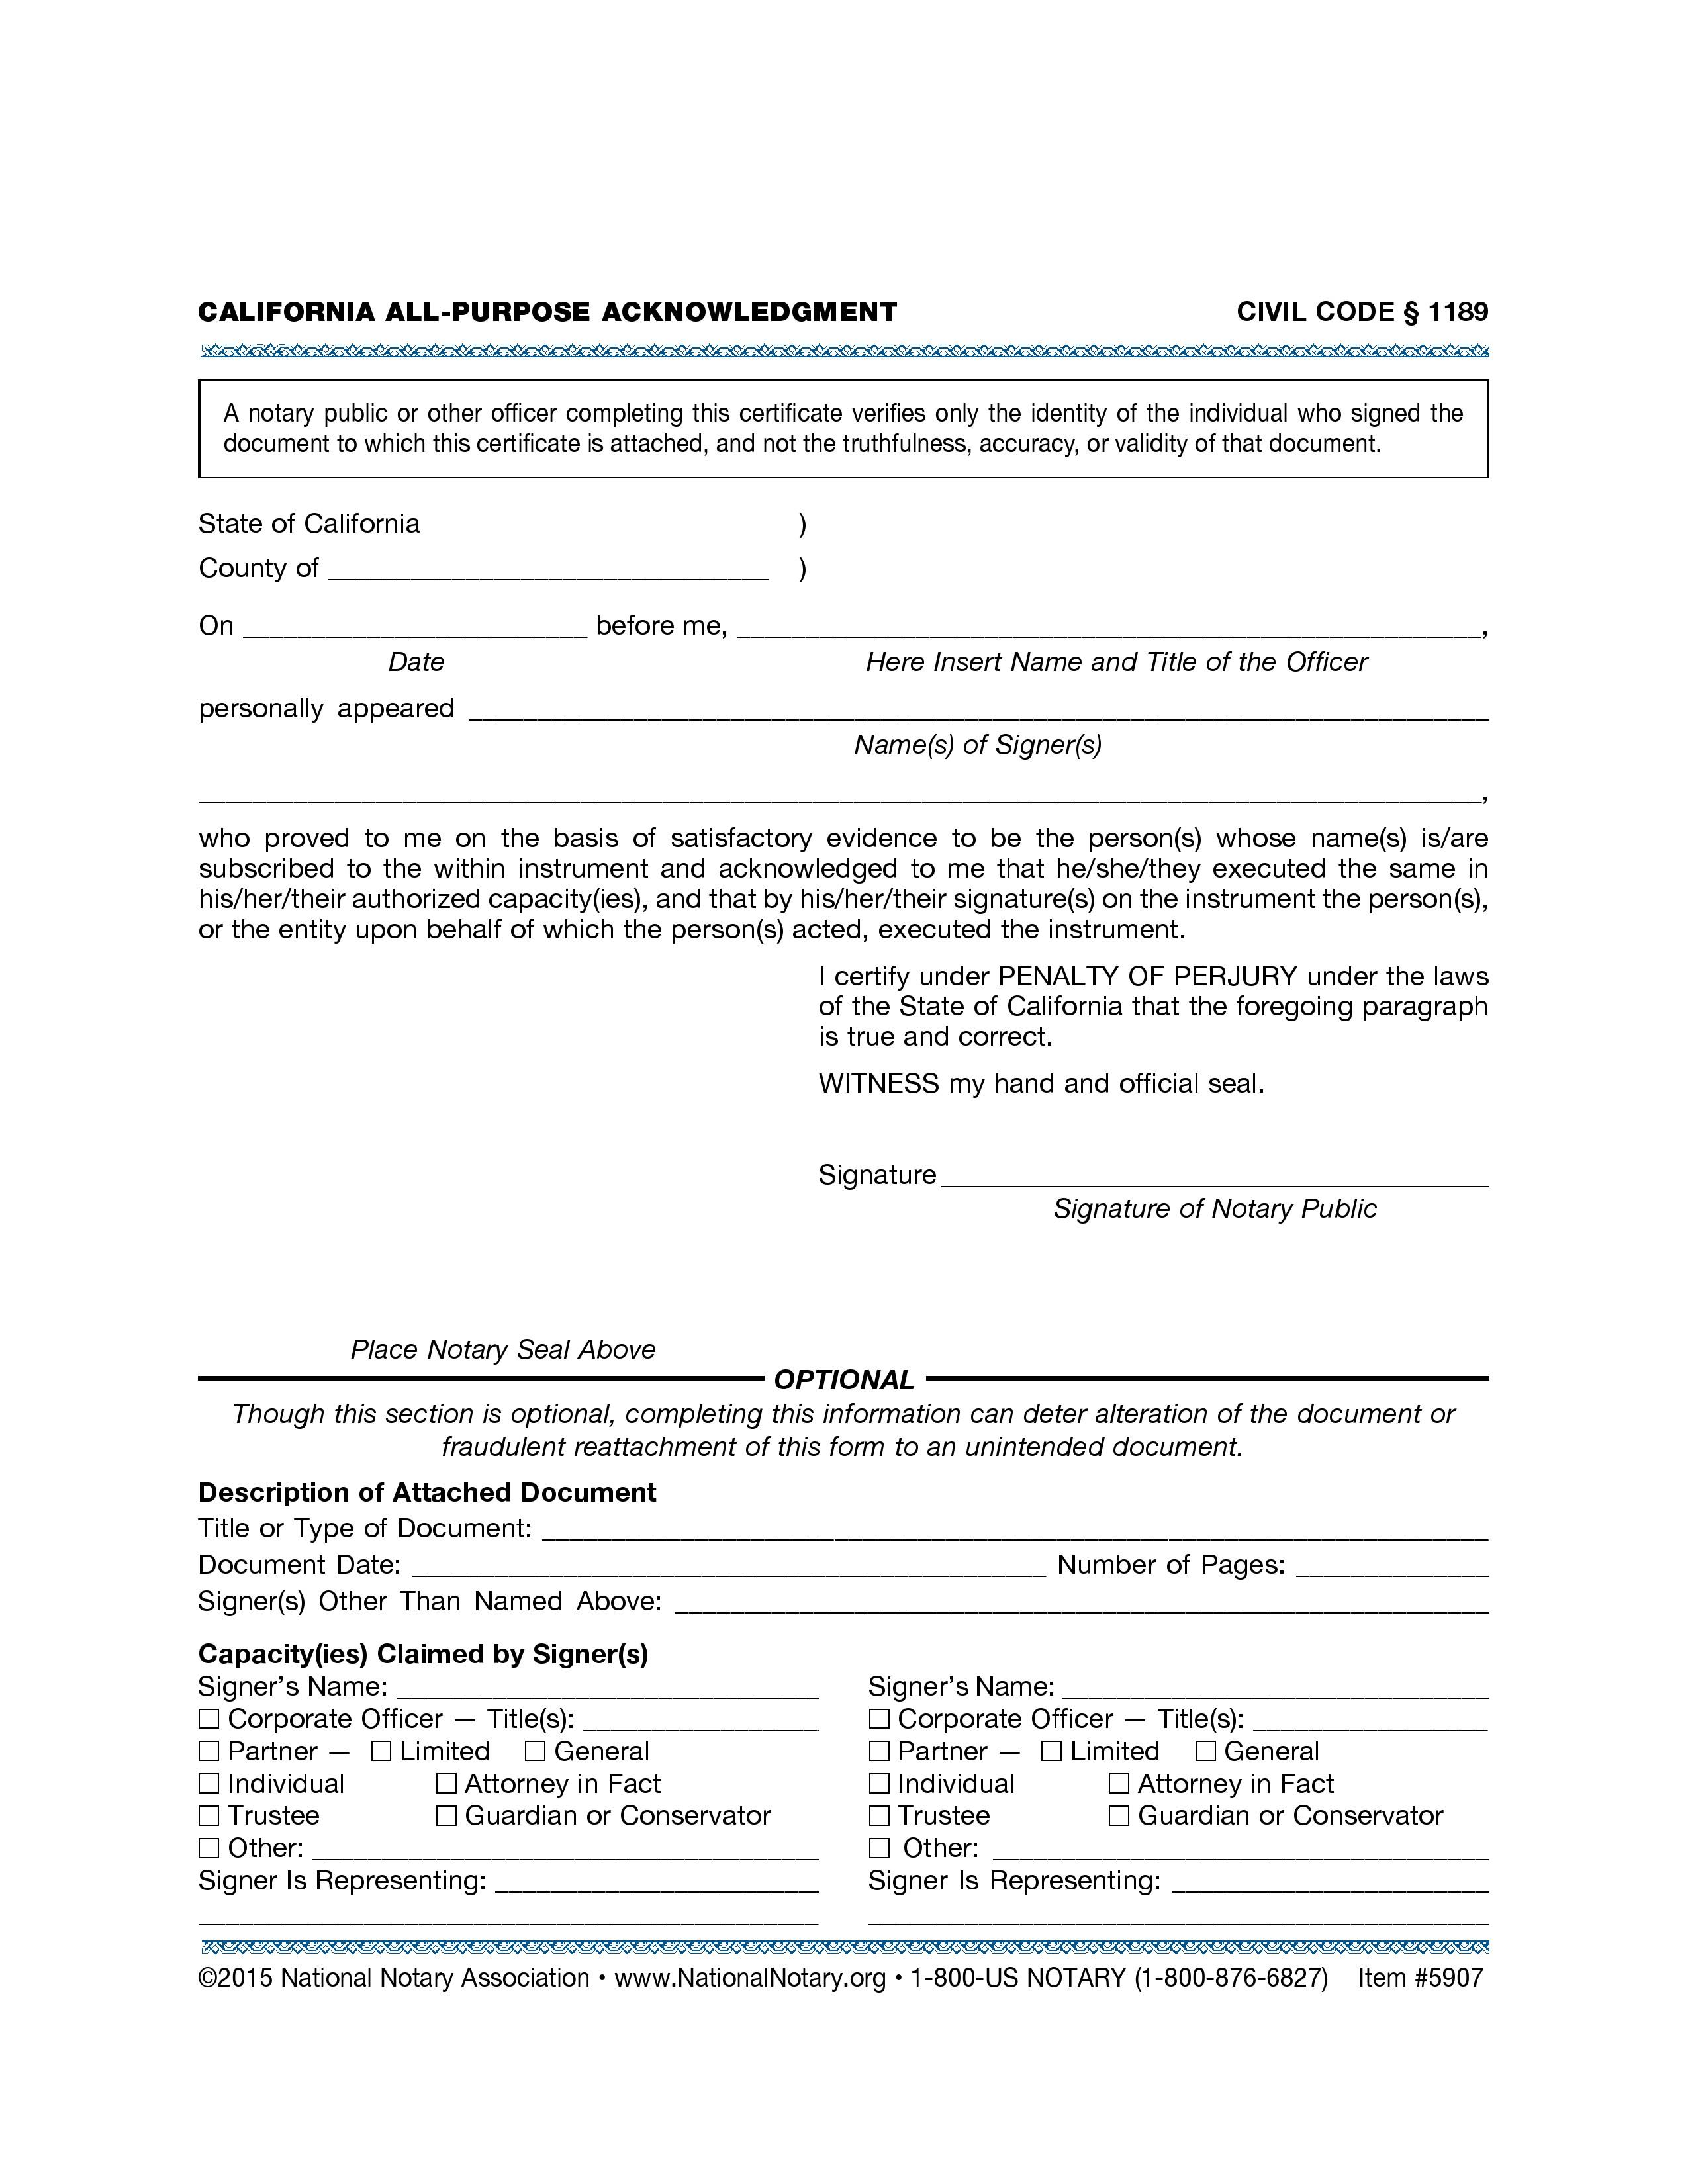 California All Purpose Acknowledgement Form